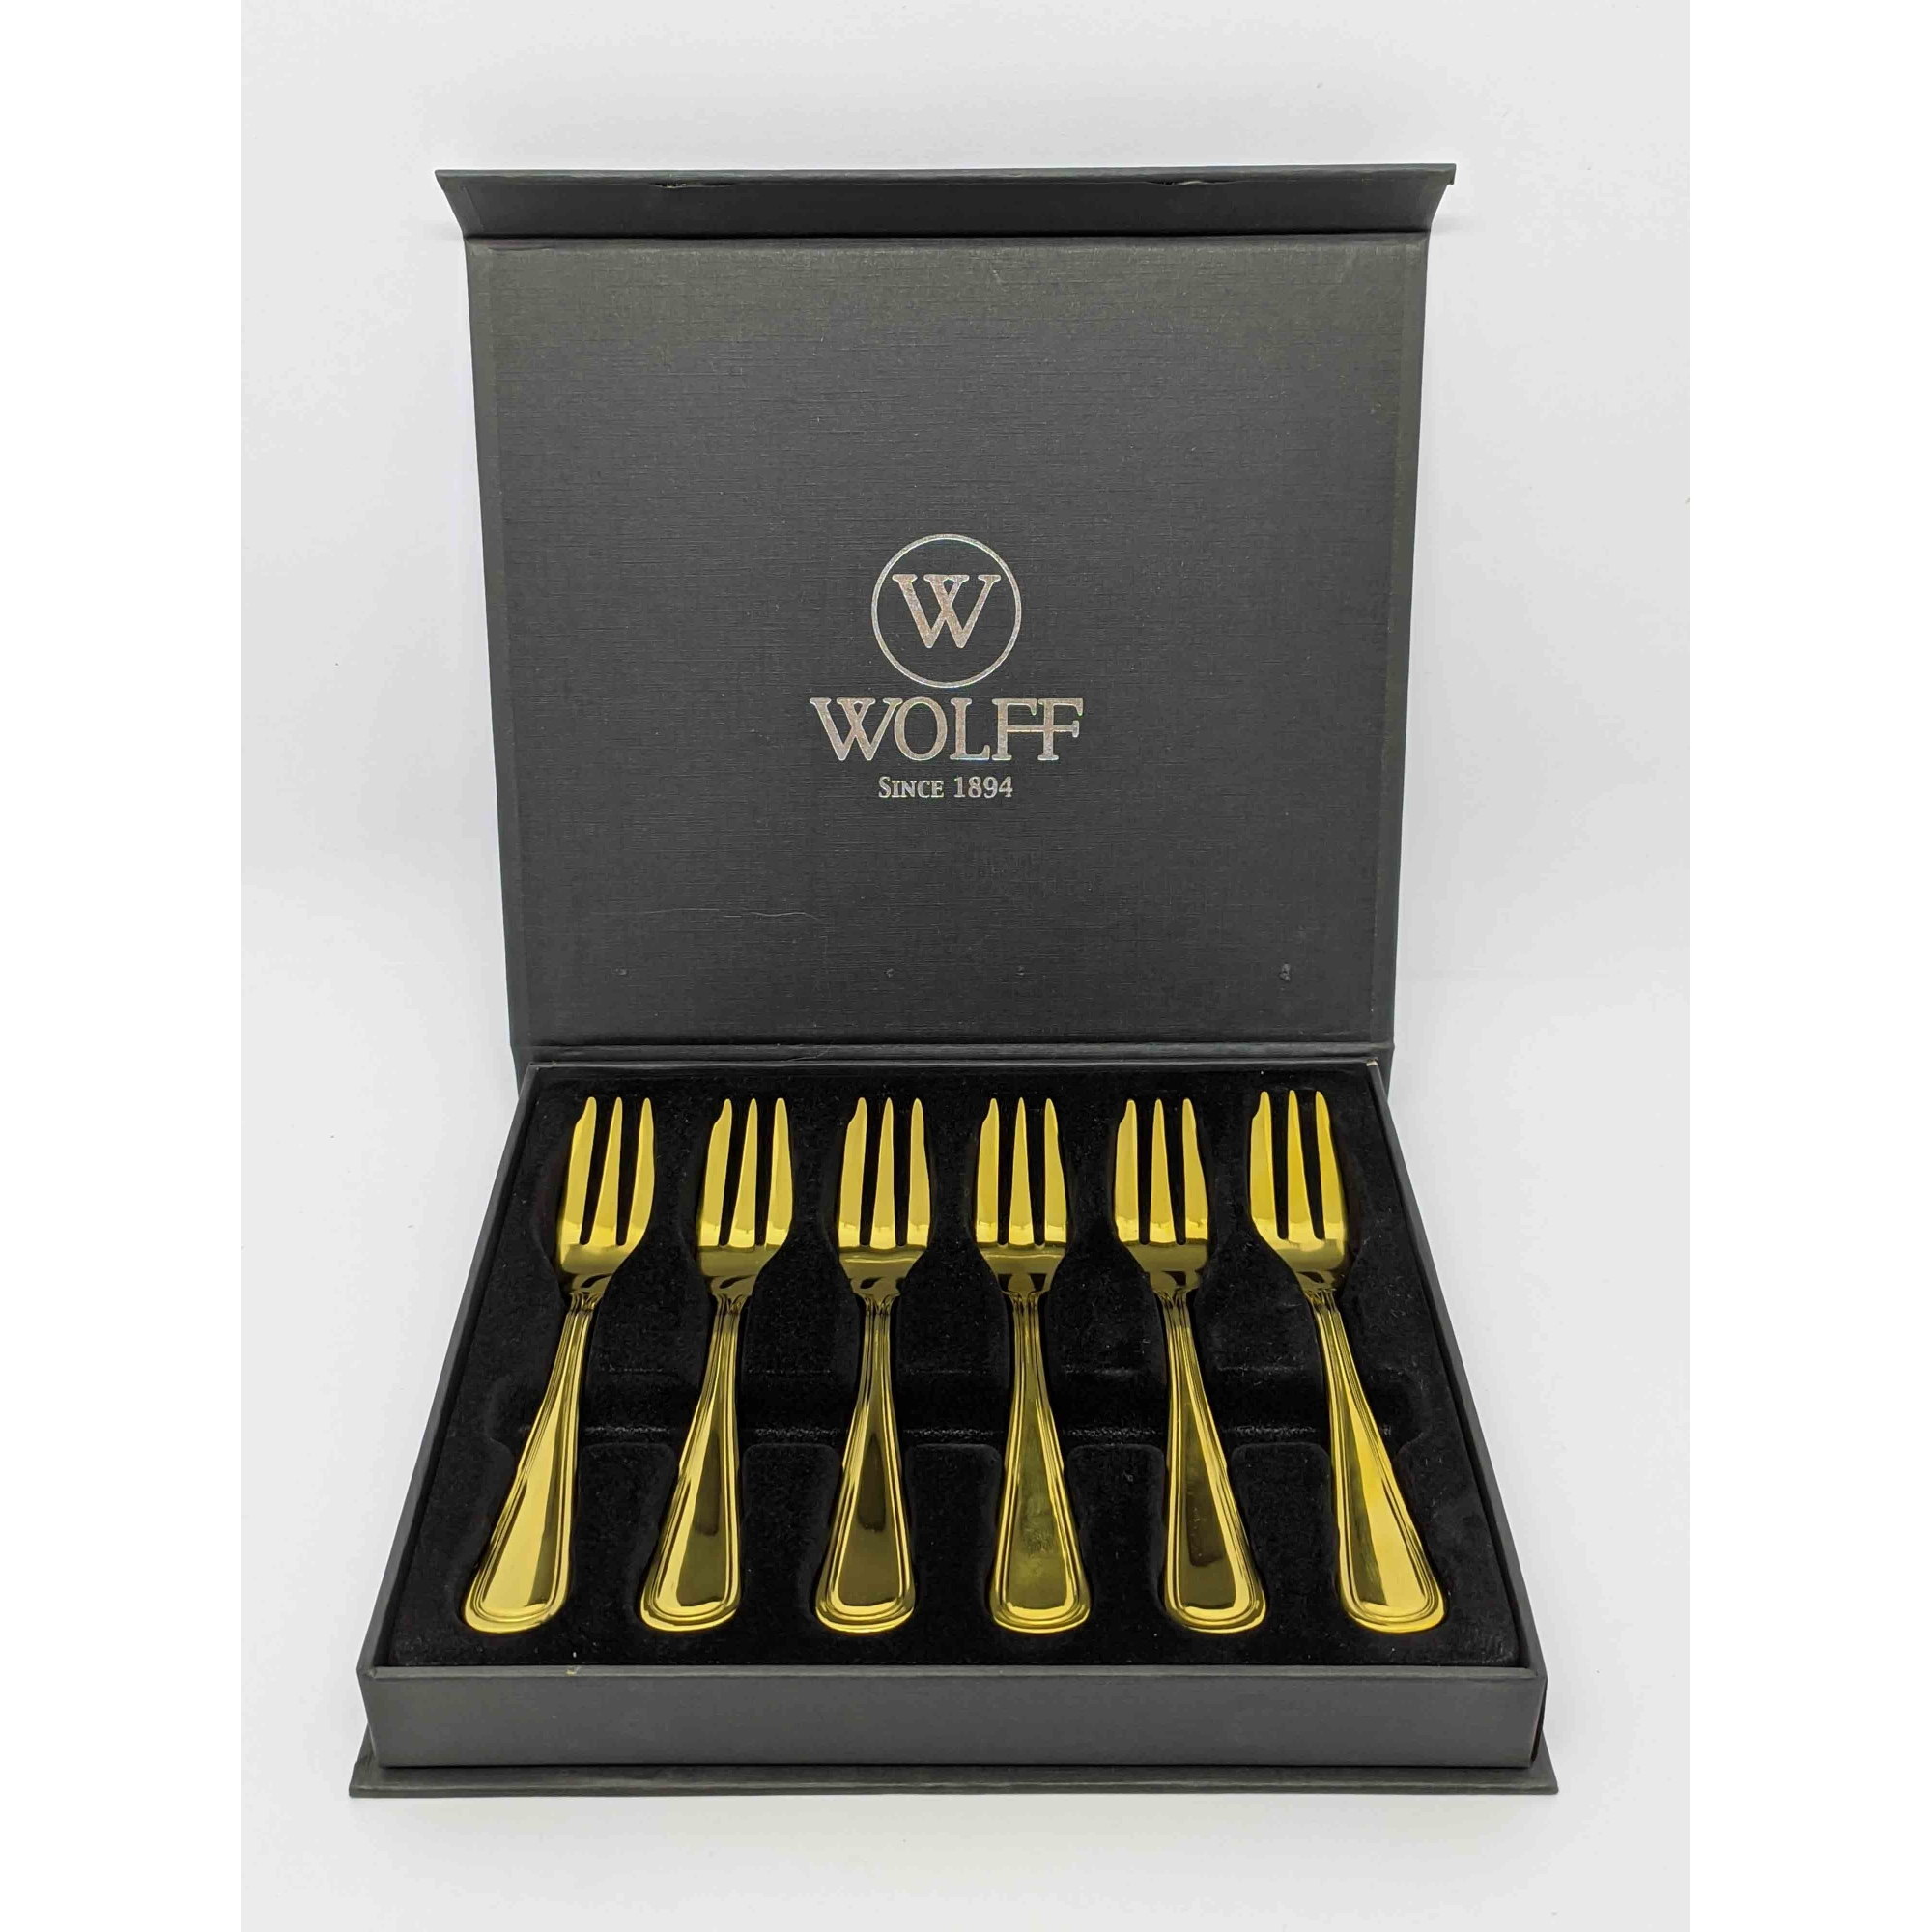 Conjunto 6 Garfos de Aço Inox P/ Bolo PVD Dourado Avalon